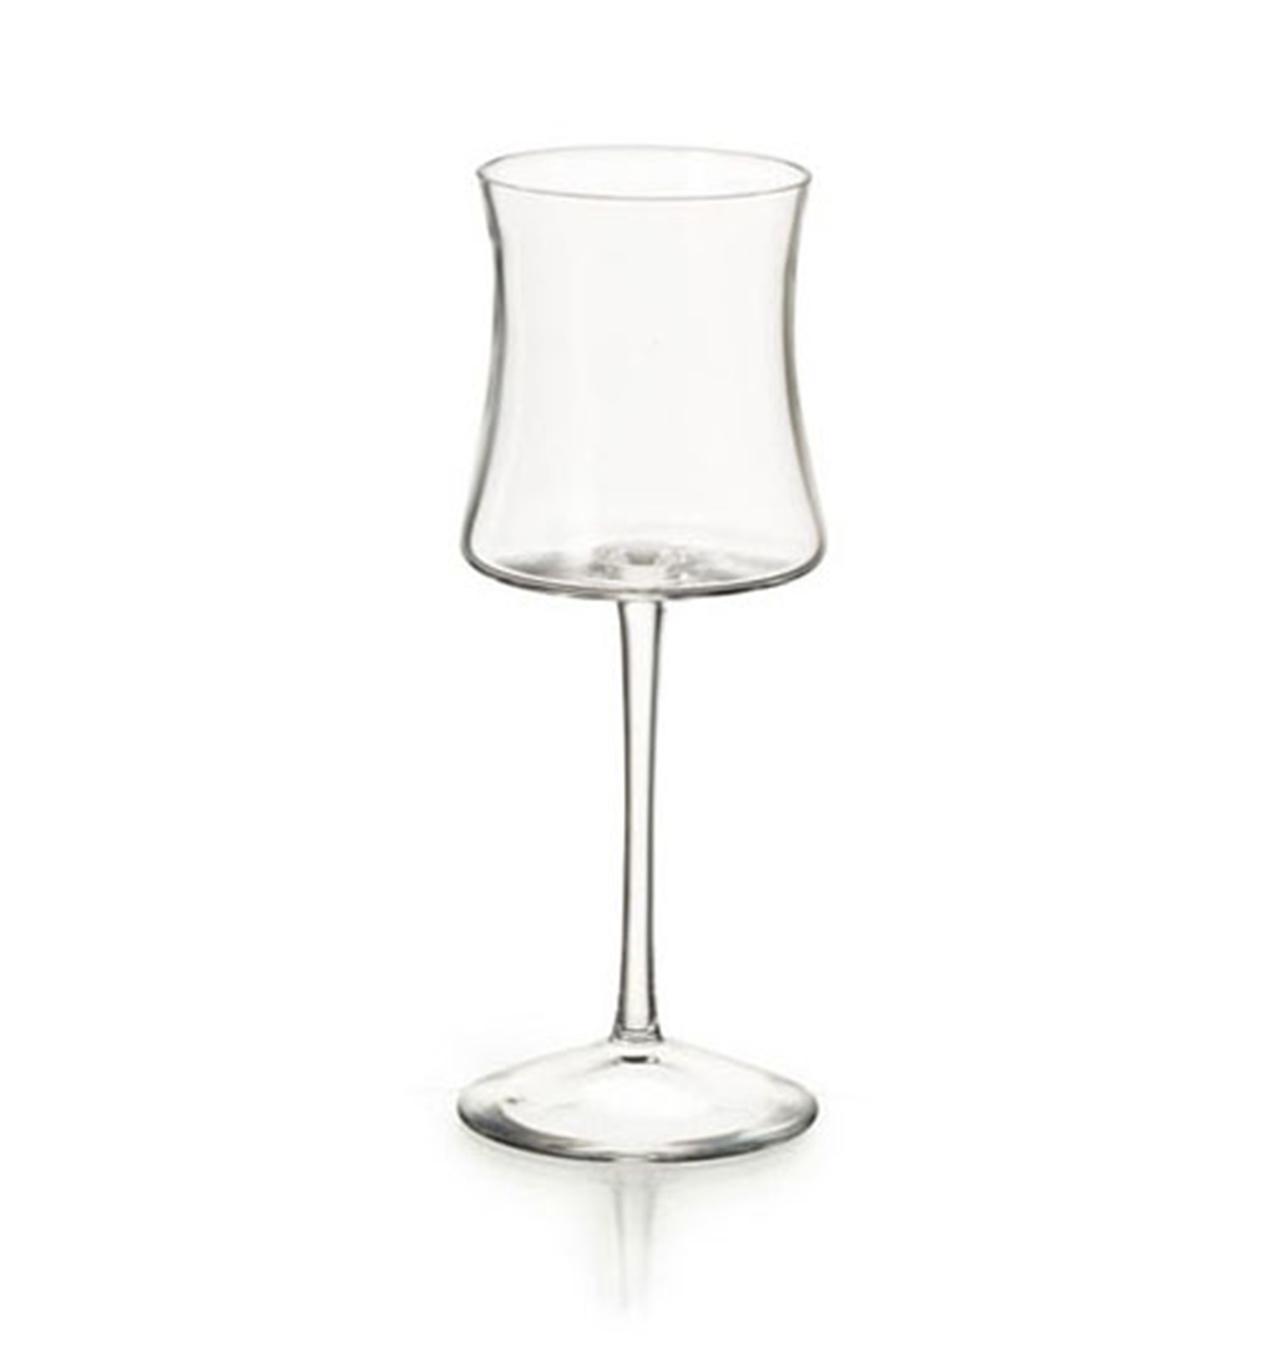 Village - Cálice de Vinho Branco